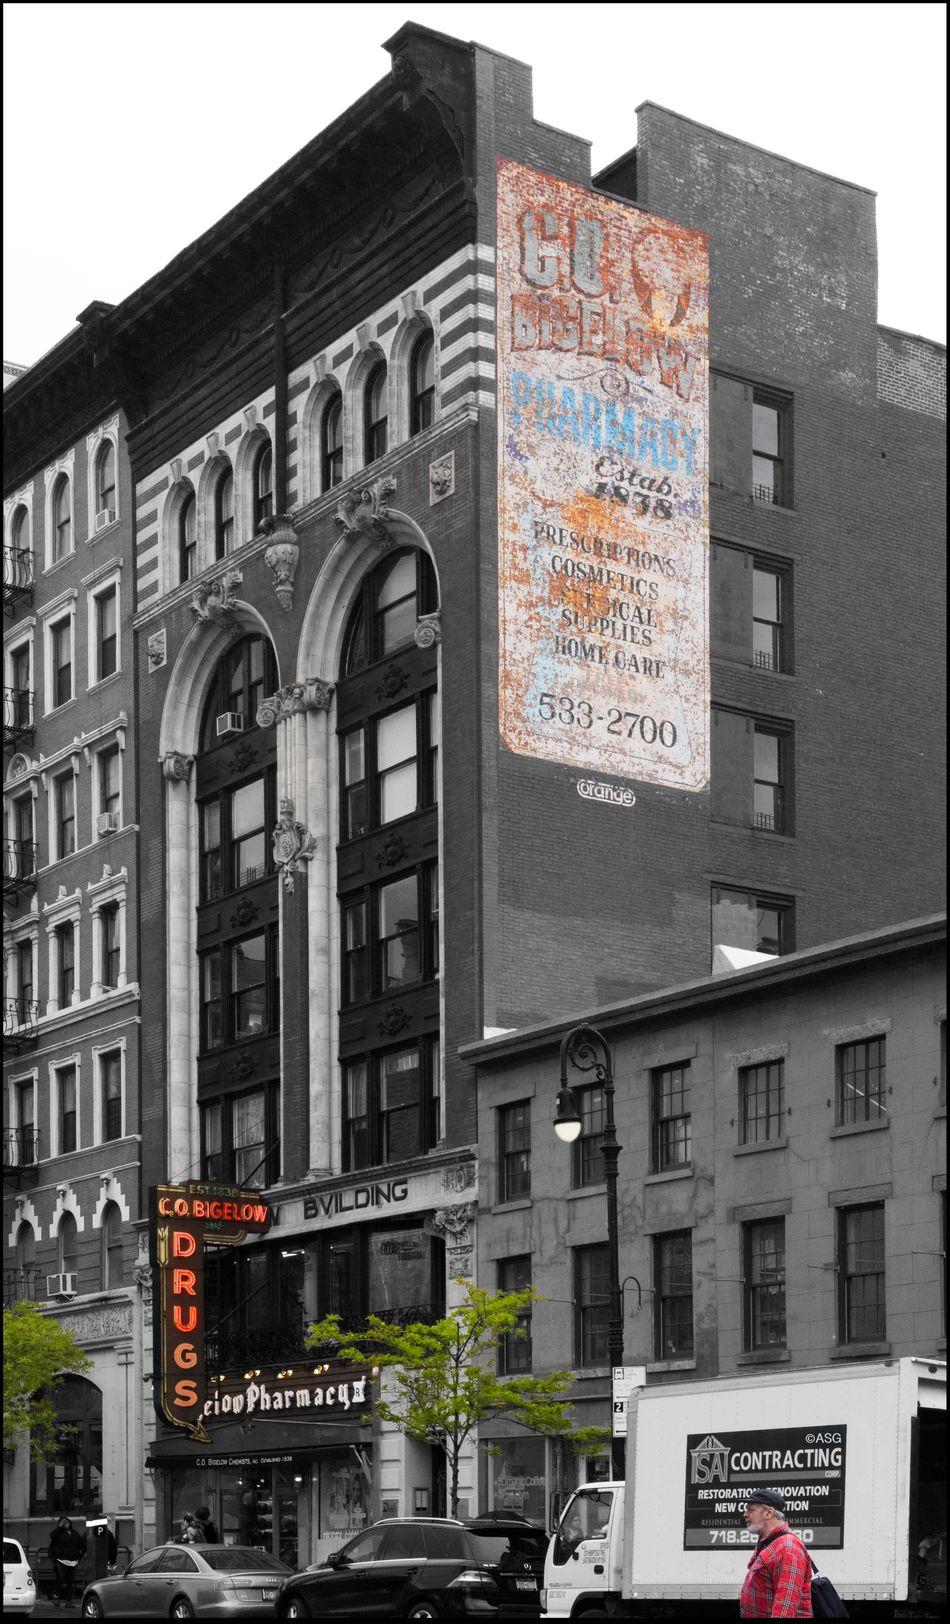 Greenwich Village Landmark - C.O. Bigelow _ Estab. 1838 - 5/3/16 As I Sees It Building Exterior City Life Creative Selections & Adjustments W/ Ps CC2016 EyeEm StreetPhotography, NYC Pre WW2 Building